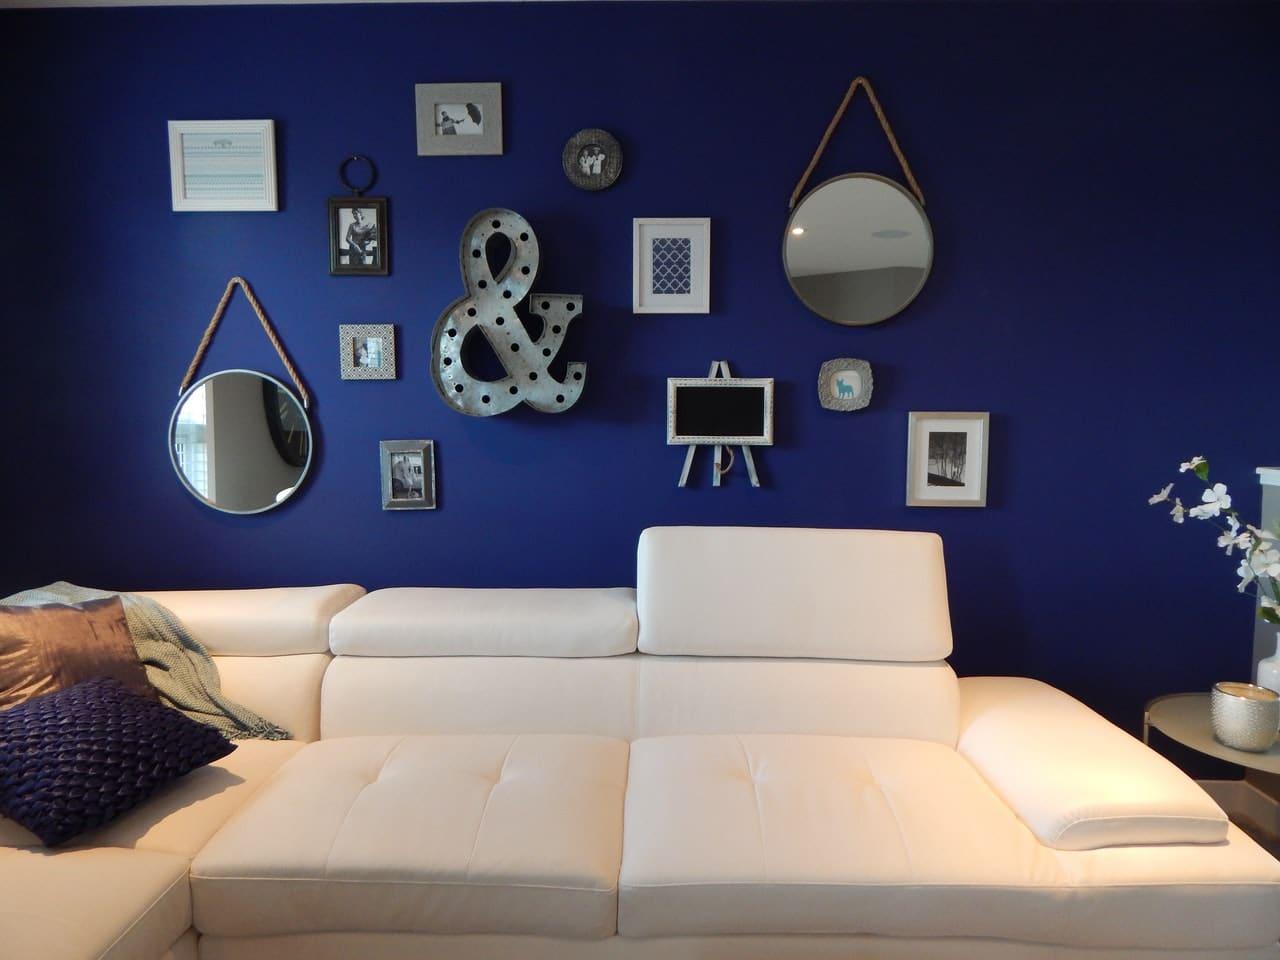 Home Interior Design Article Image